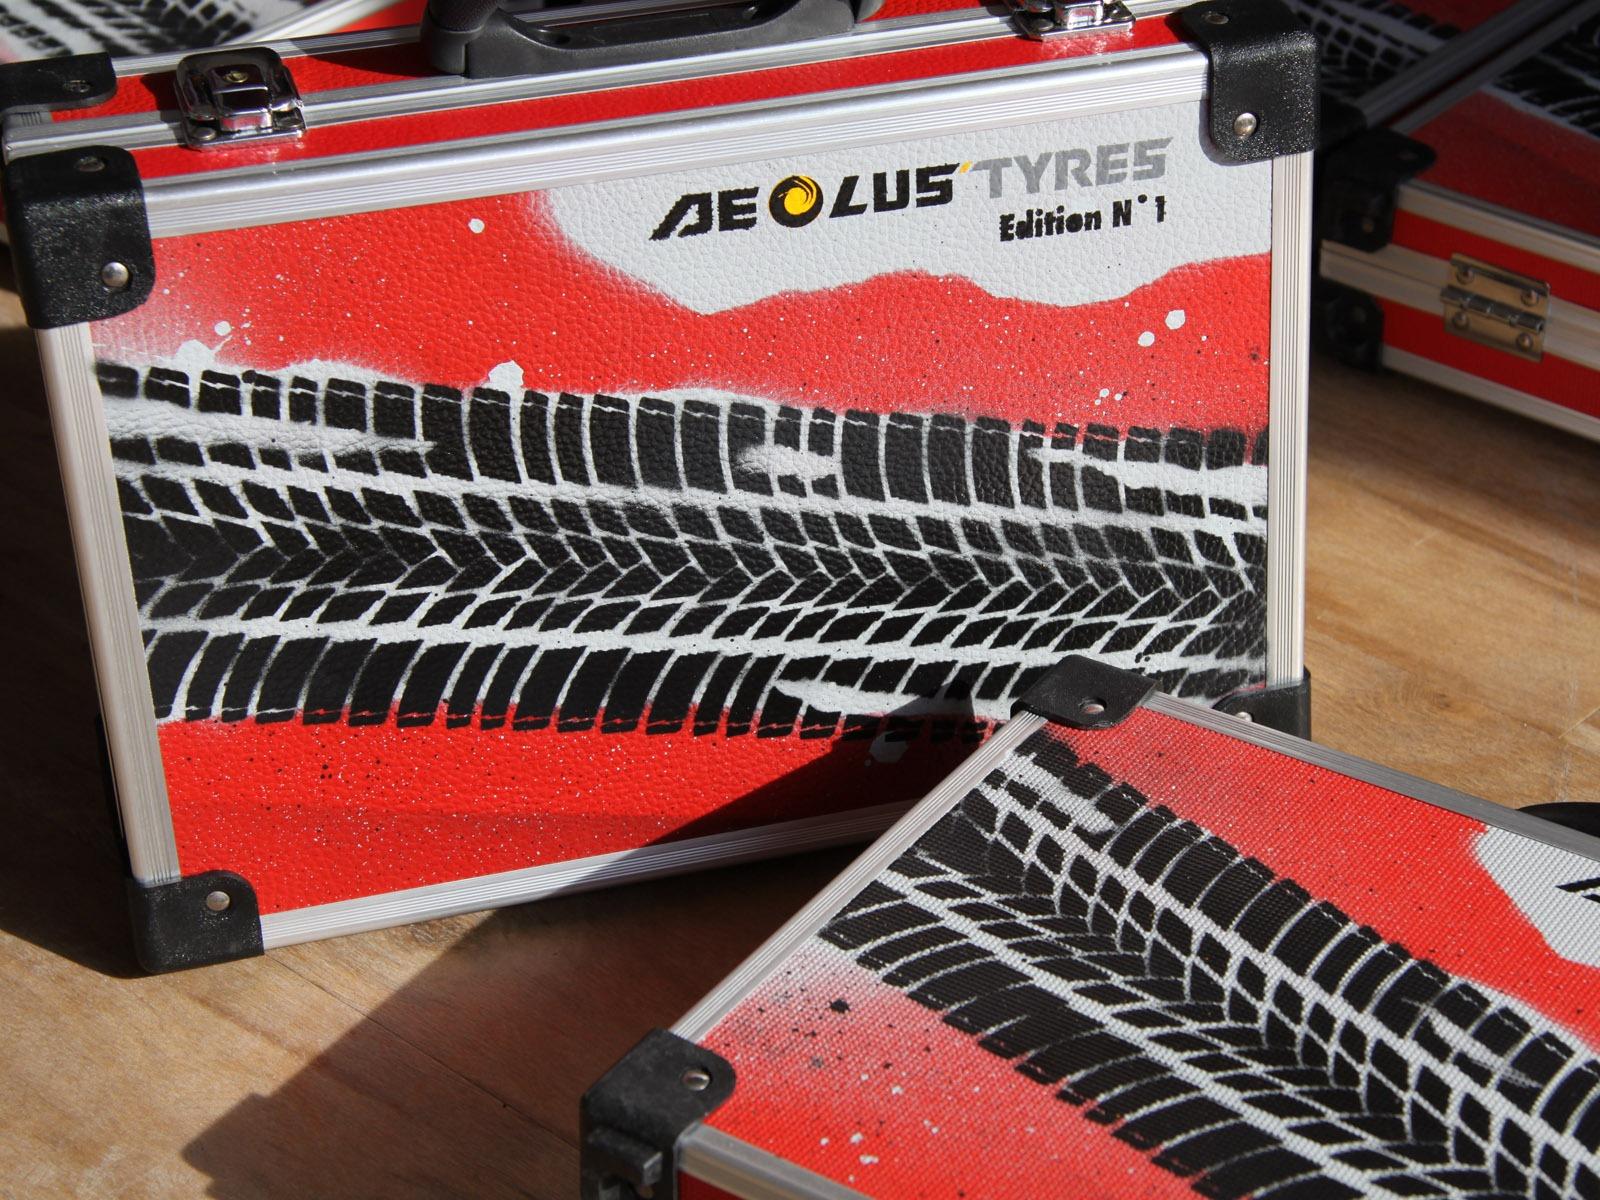 graffitikuenstler-artmos4-graffitiauftrag-objektgestaltung-aeolus-tyres